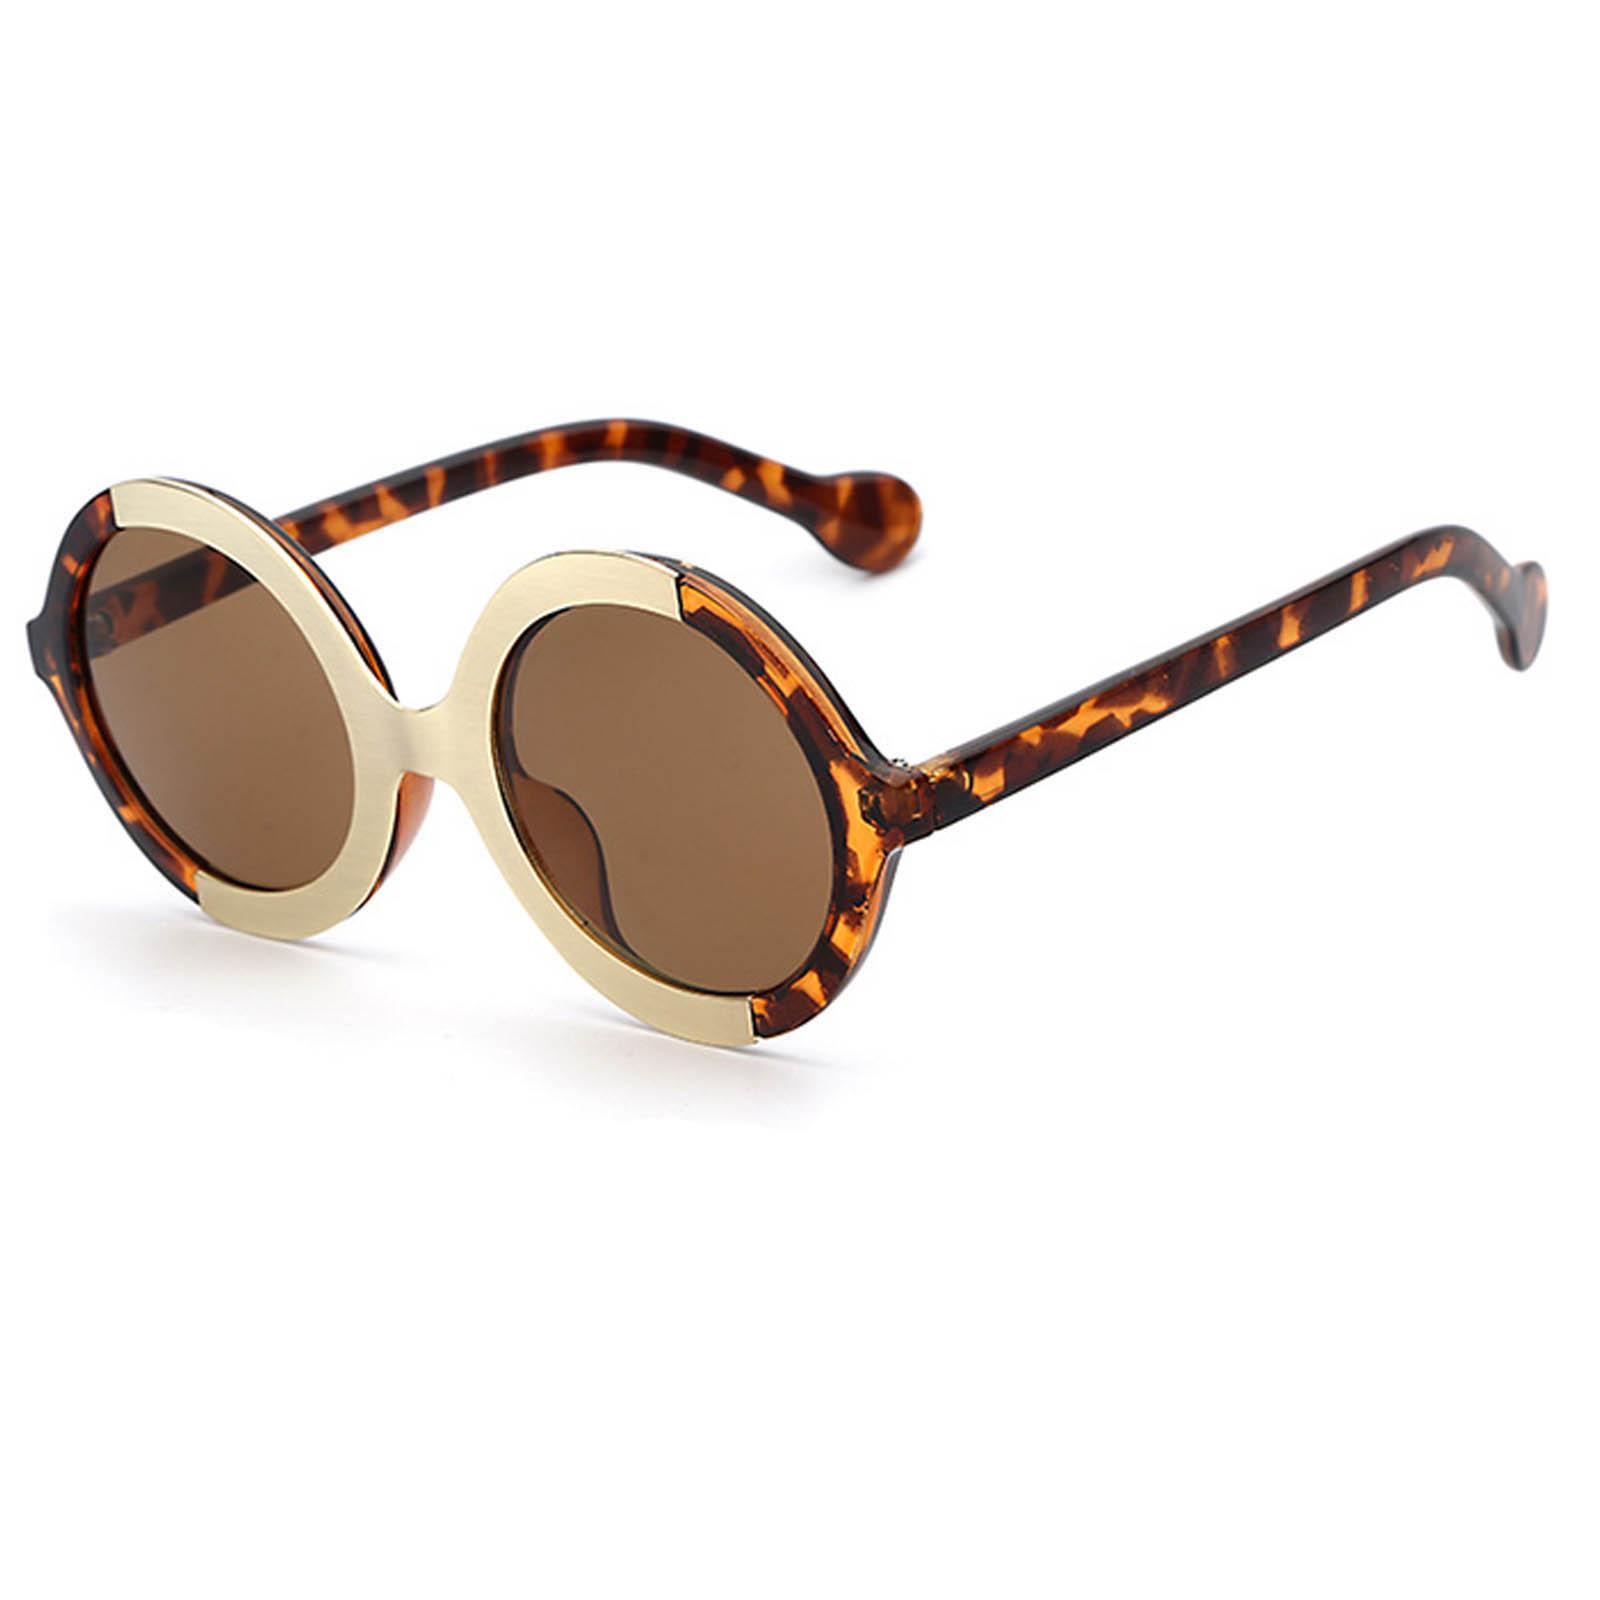 71c21d016b8 OWL ® 051 C2 Round Eyewear Sunglasses Women s Men s Plastic Round Circle  Leopard Frame Brown Lens